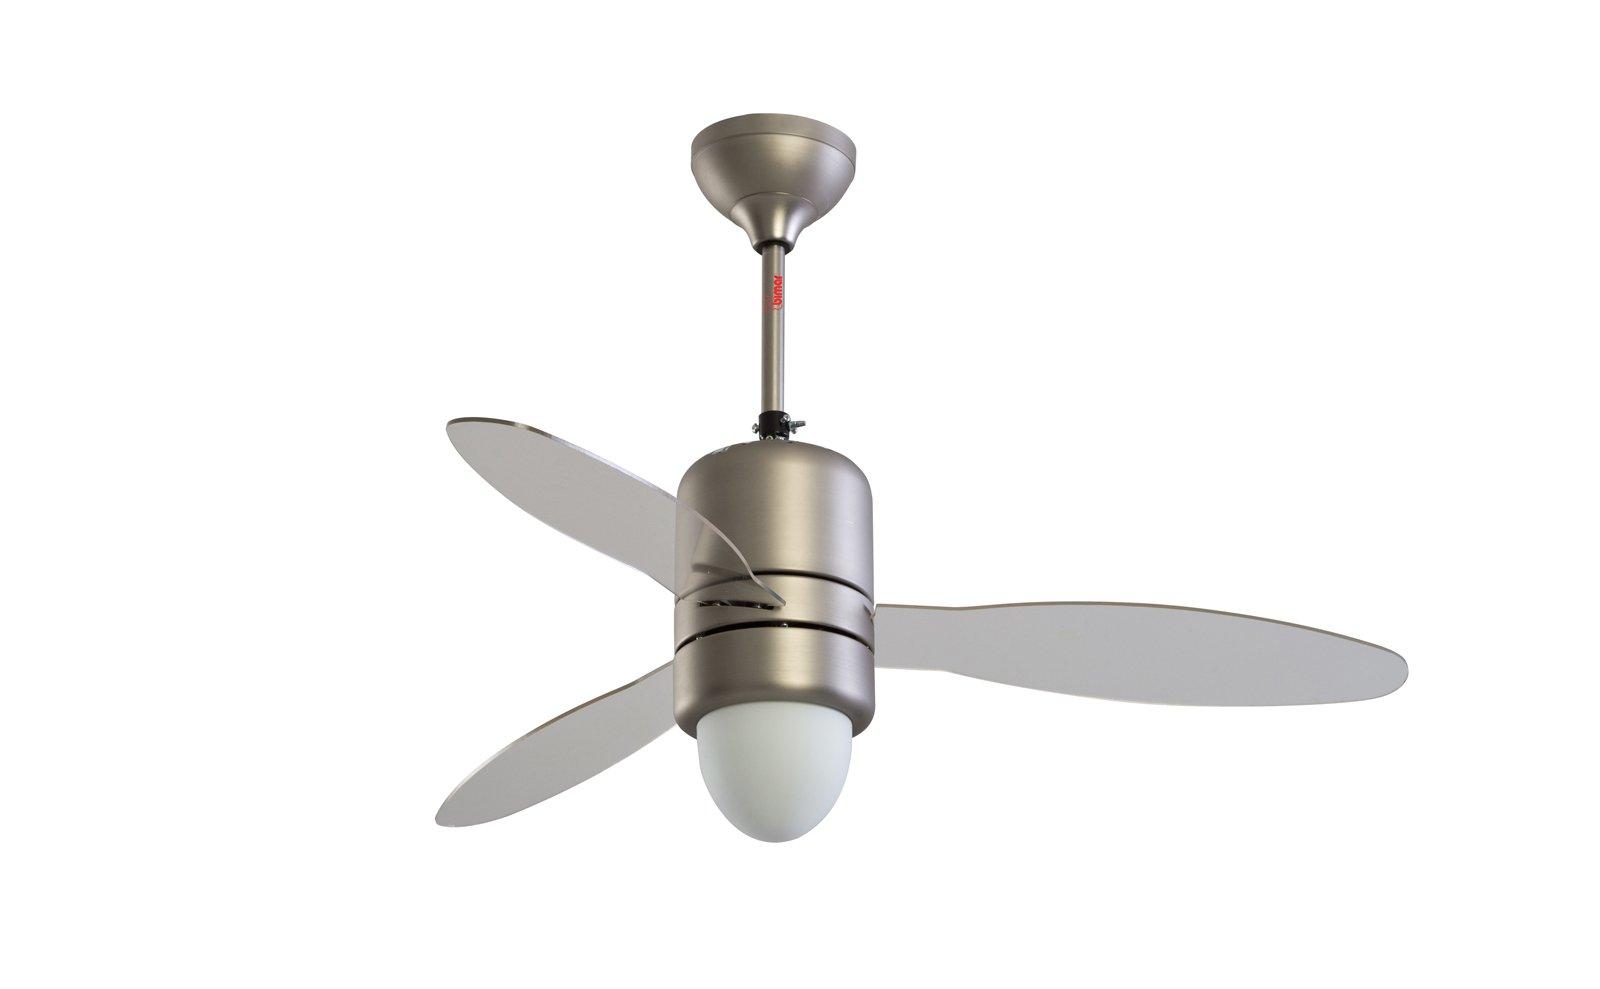 ventilatori a pale, aria fresca dall'alto - cose di casa